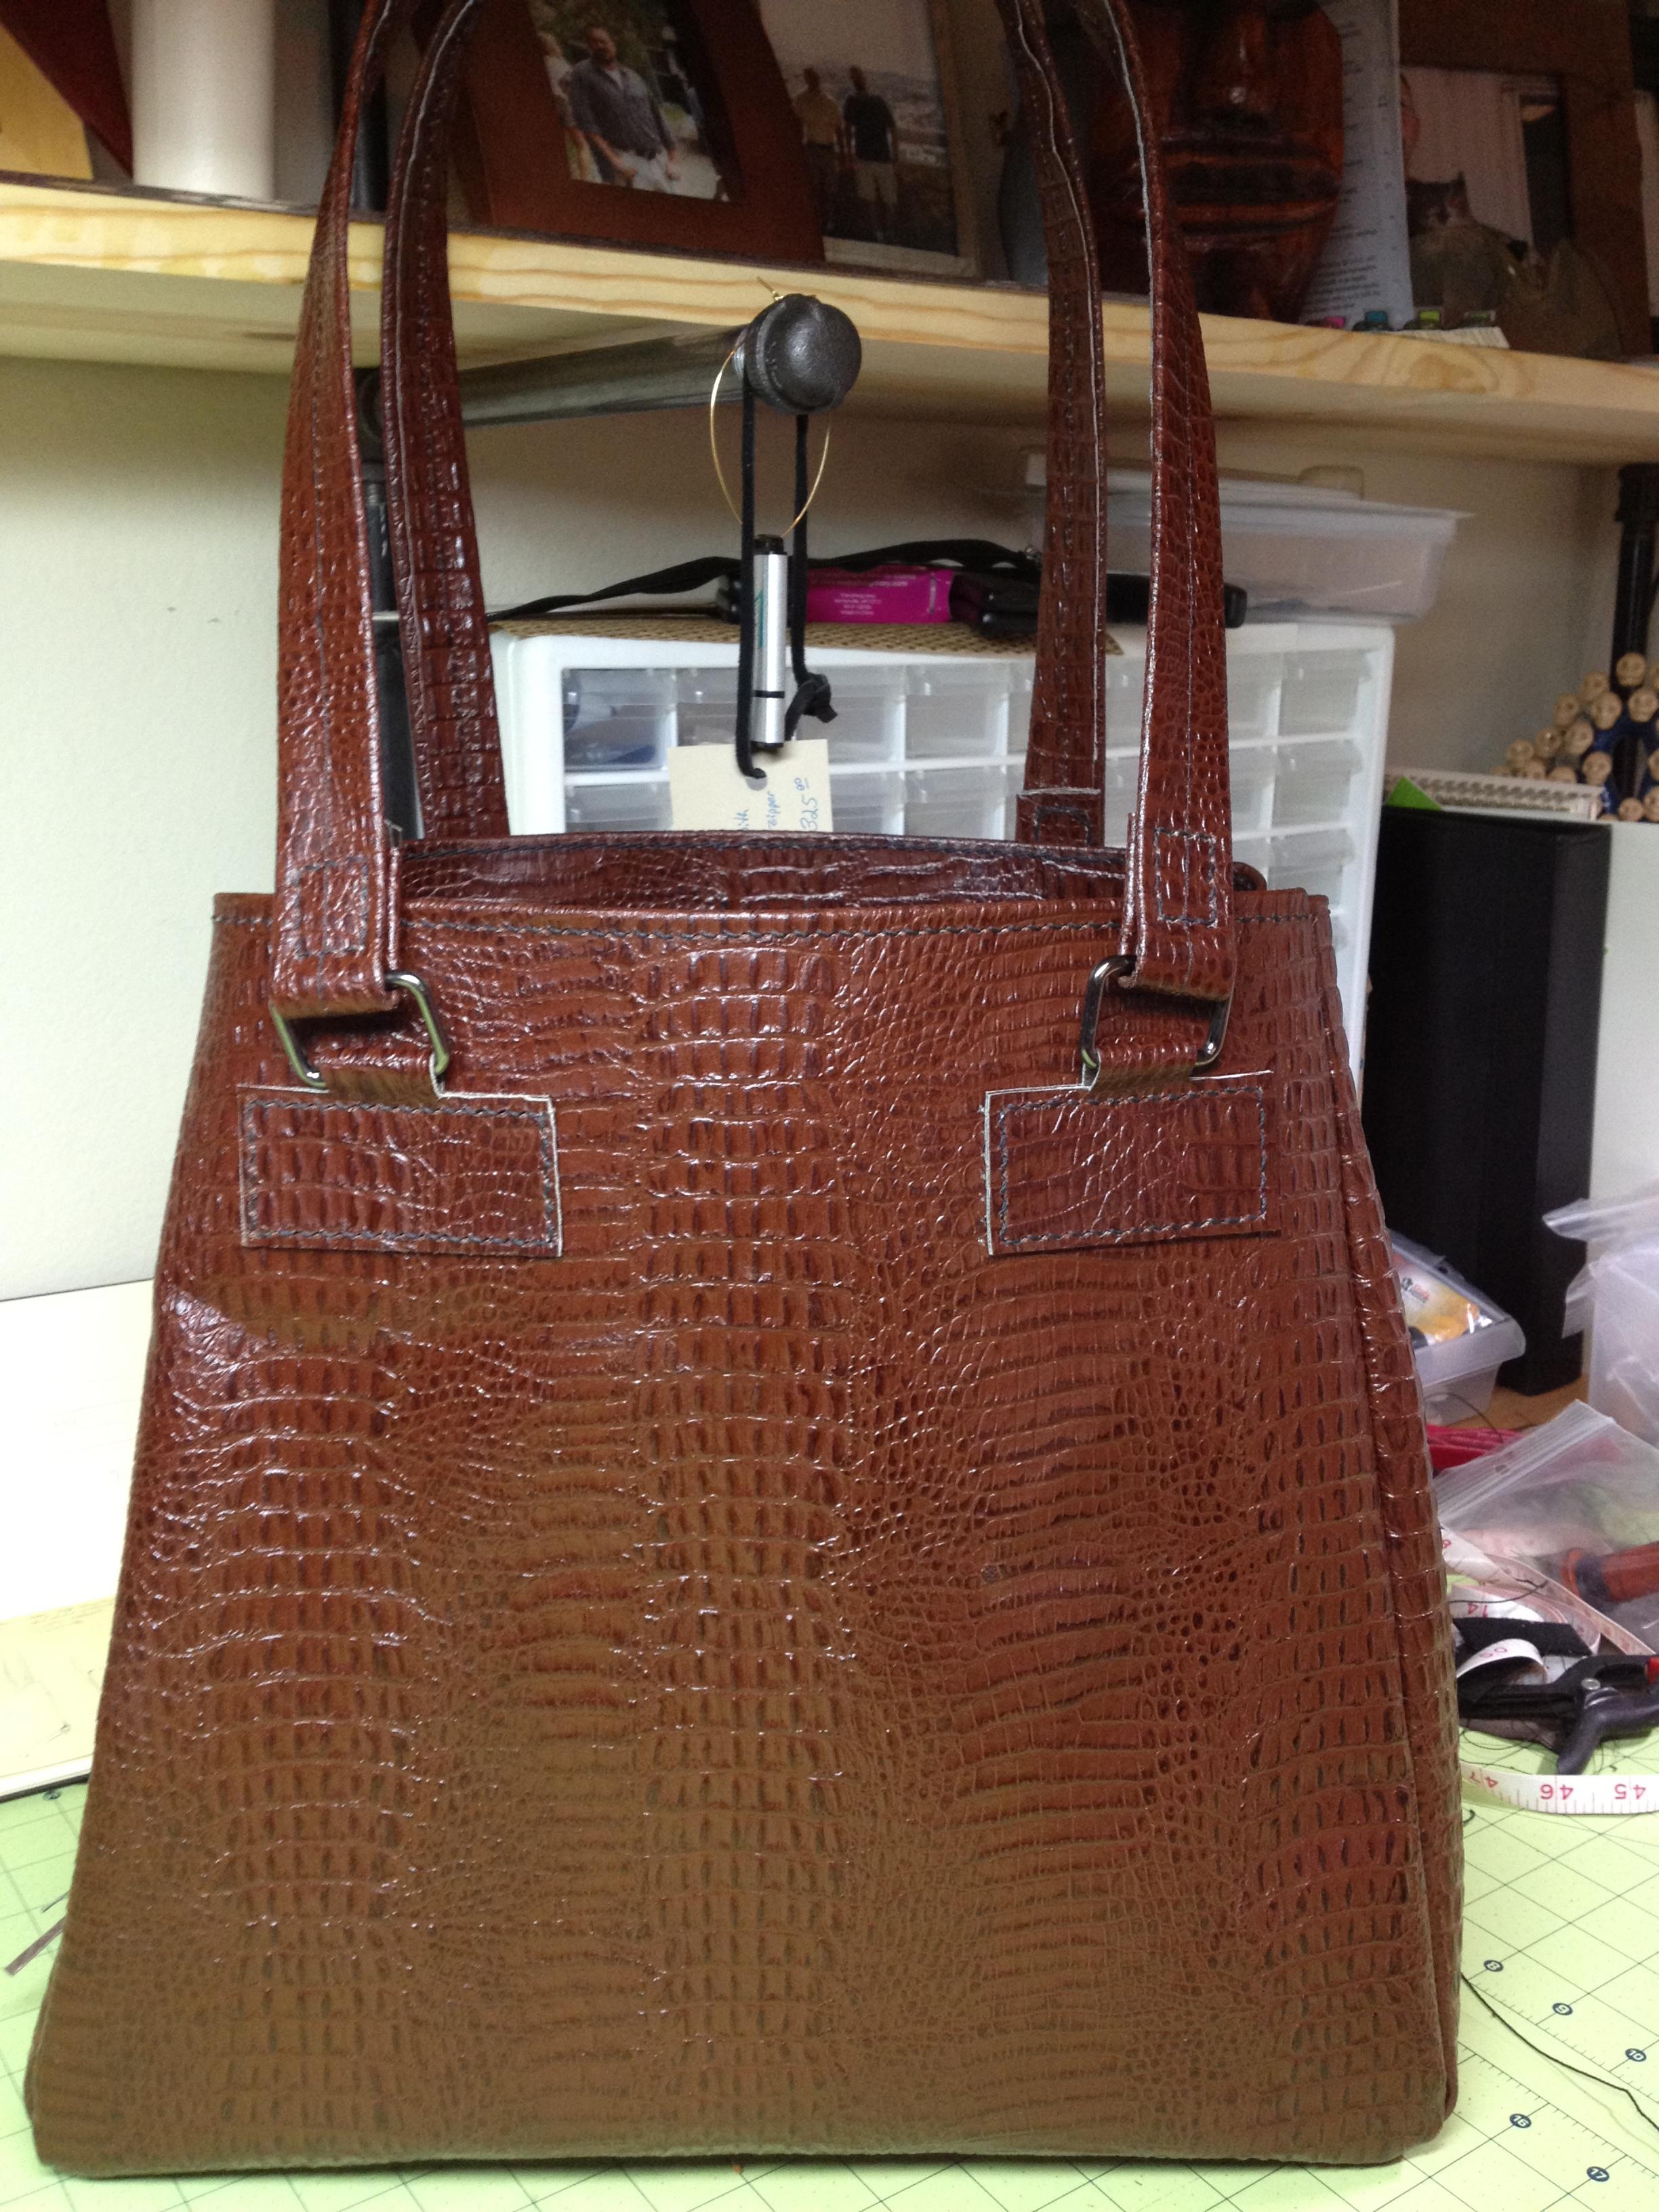 Alligator Textured Handbag